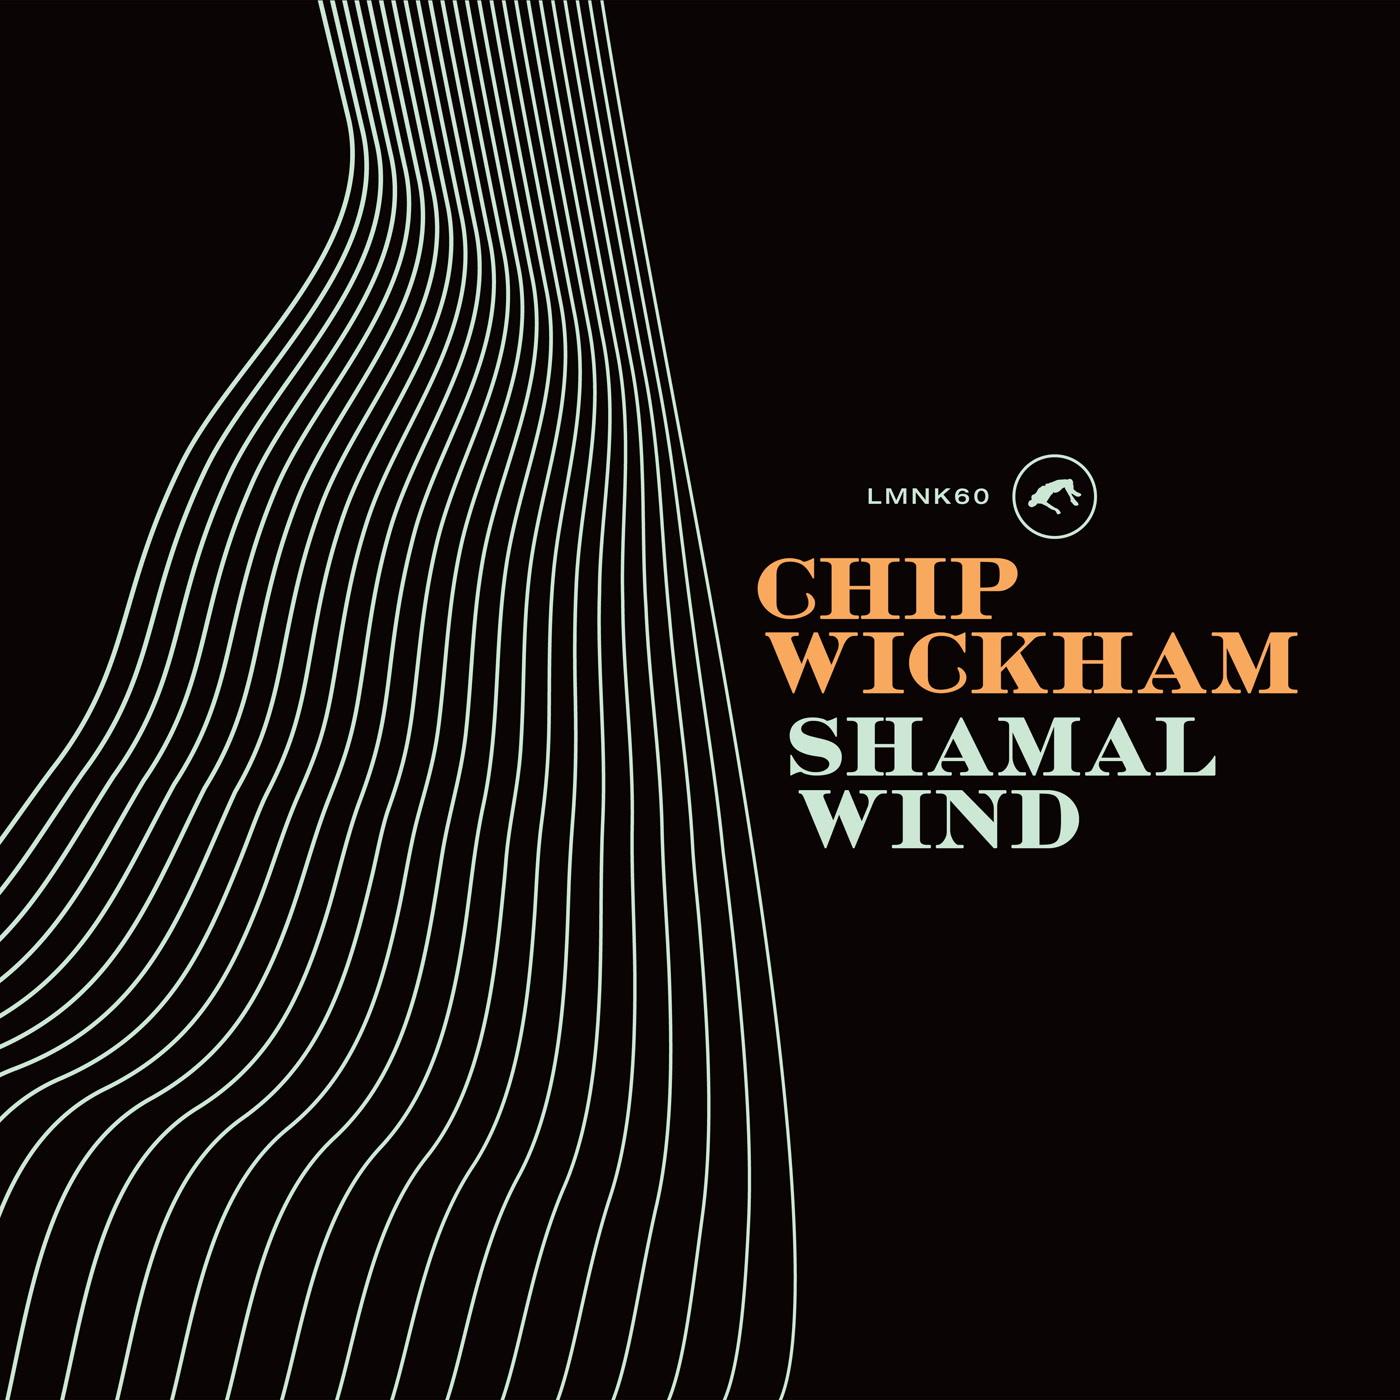 chip wickham shamal wind